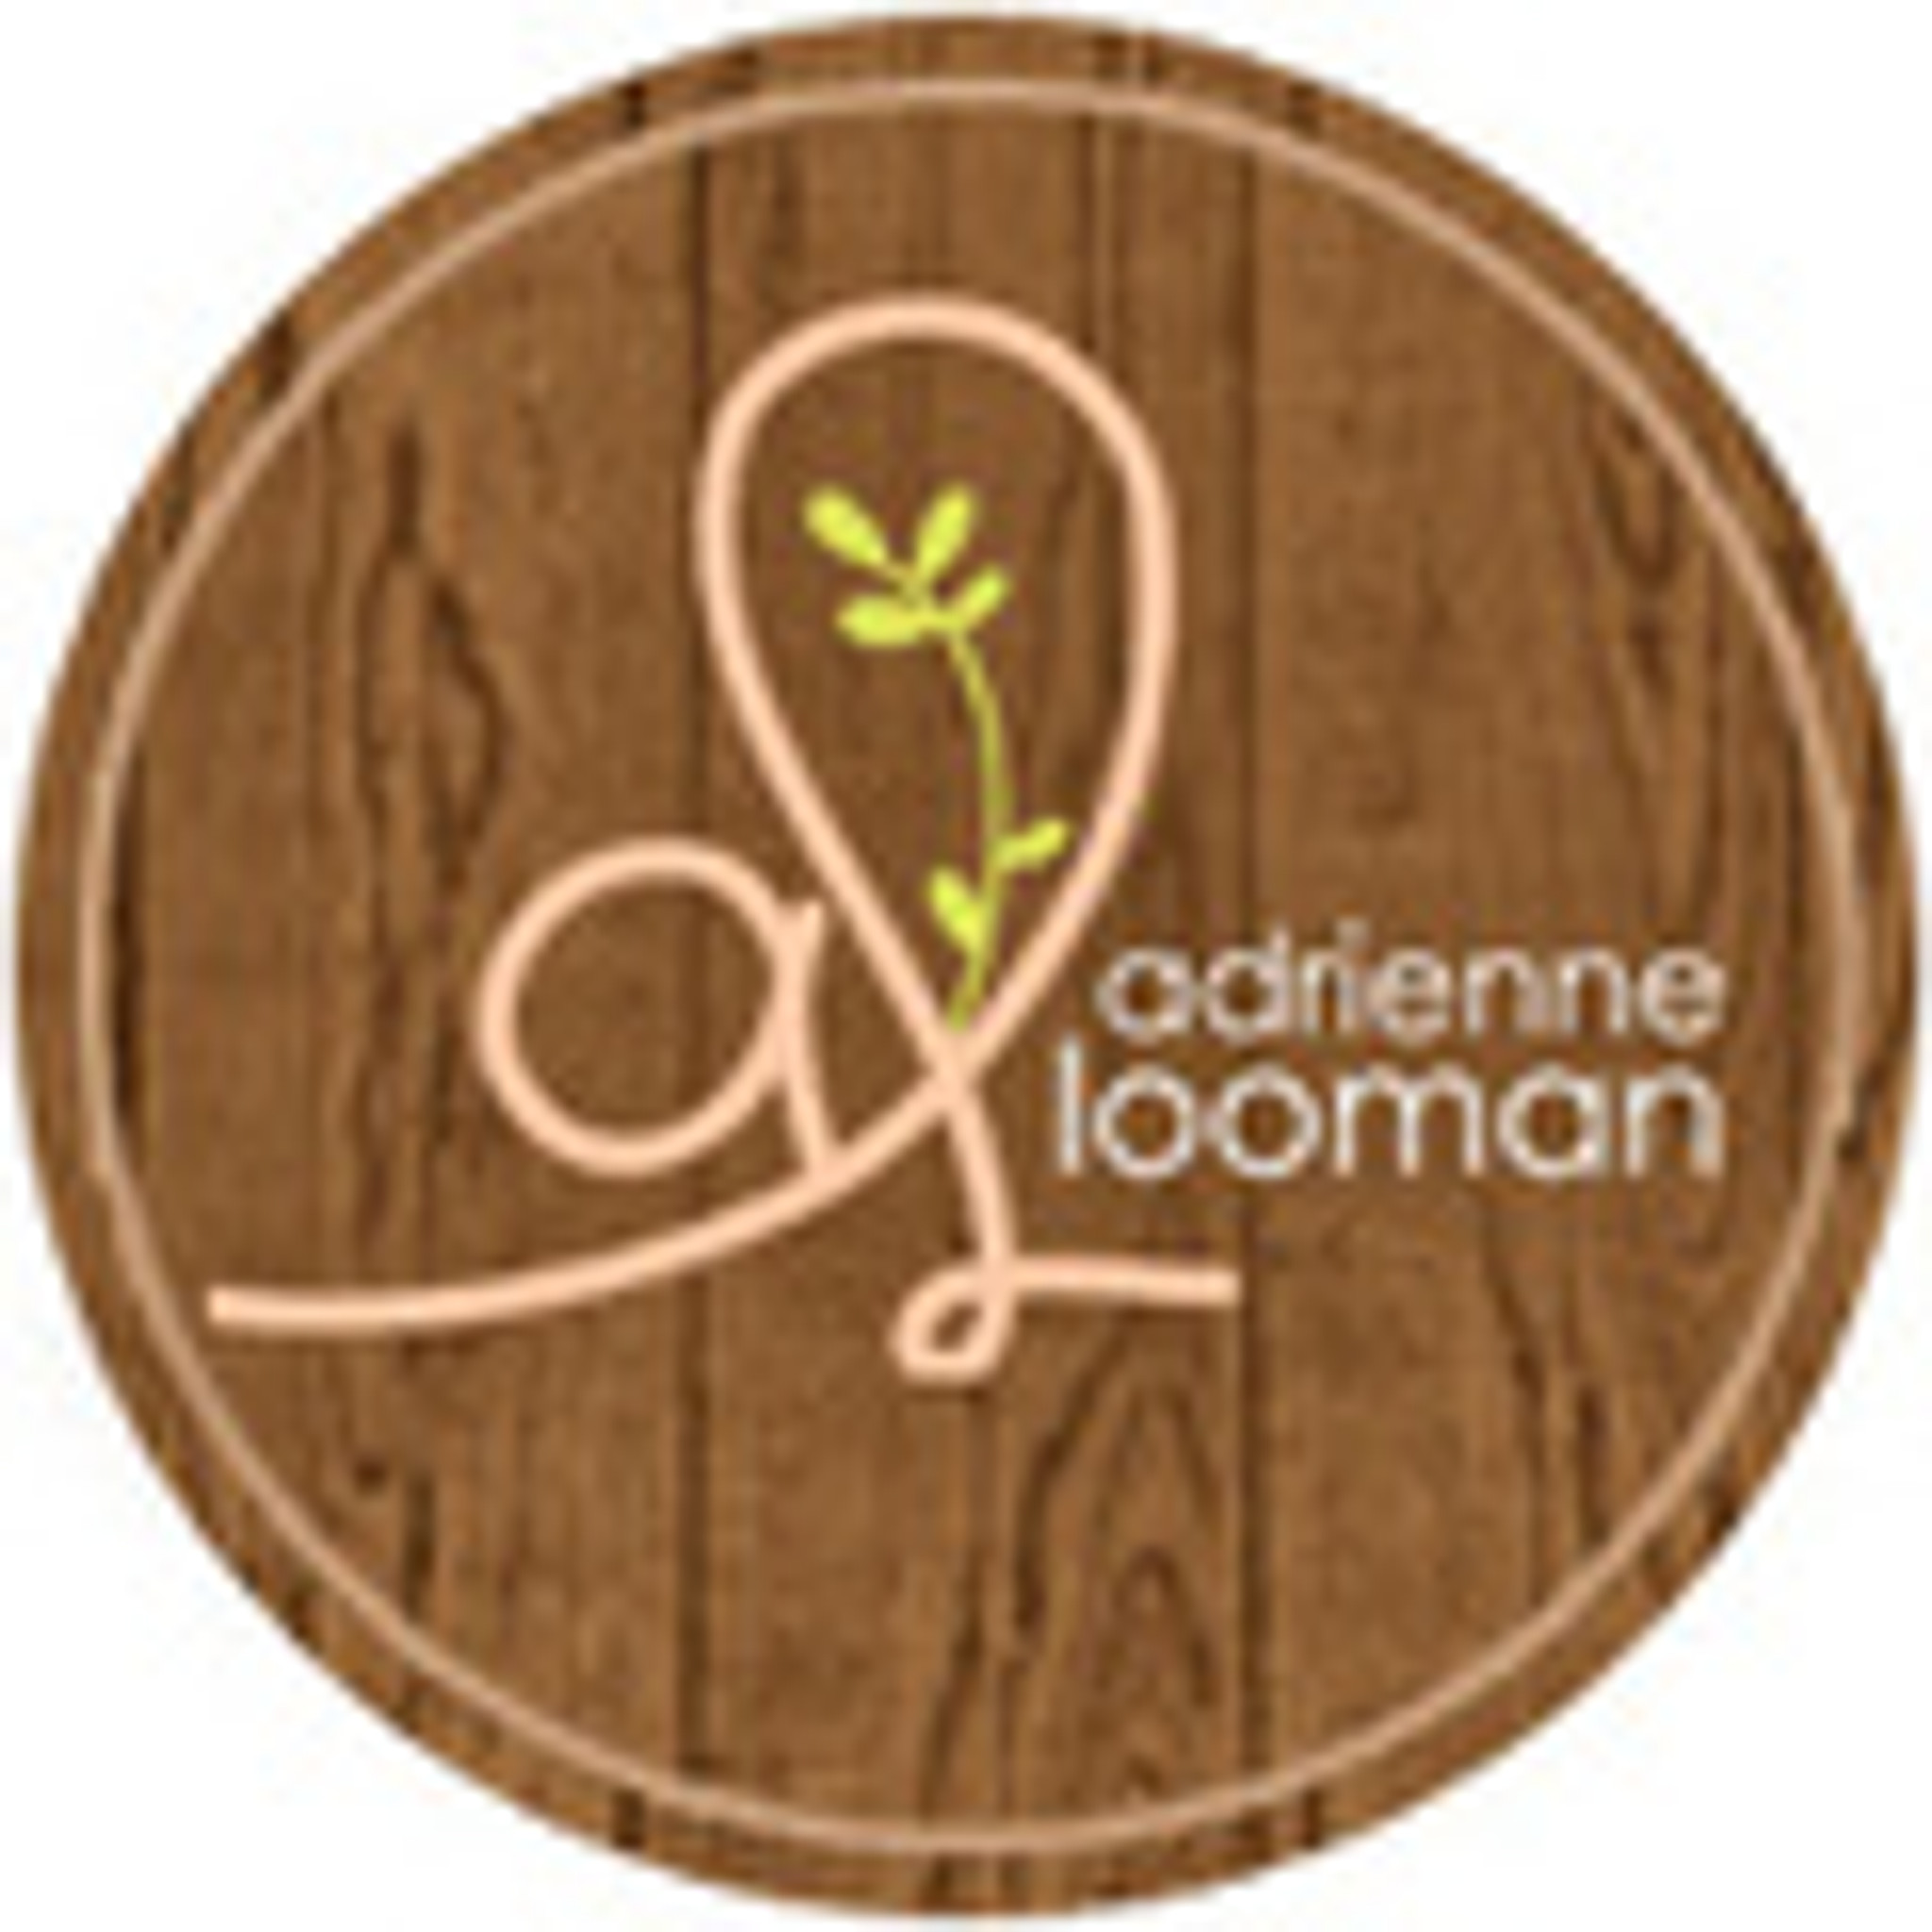 Adrienne Looman Designs